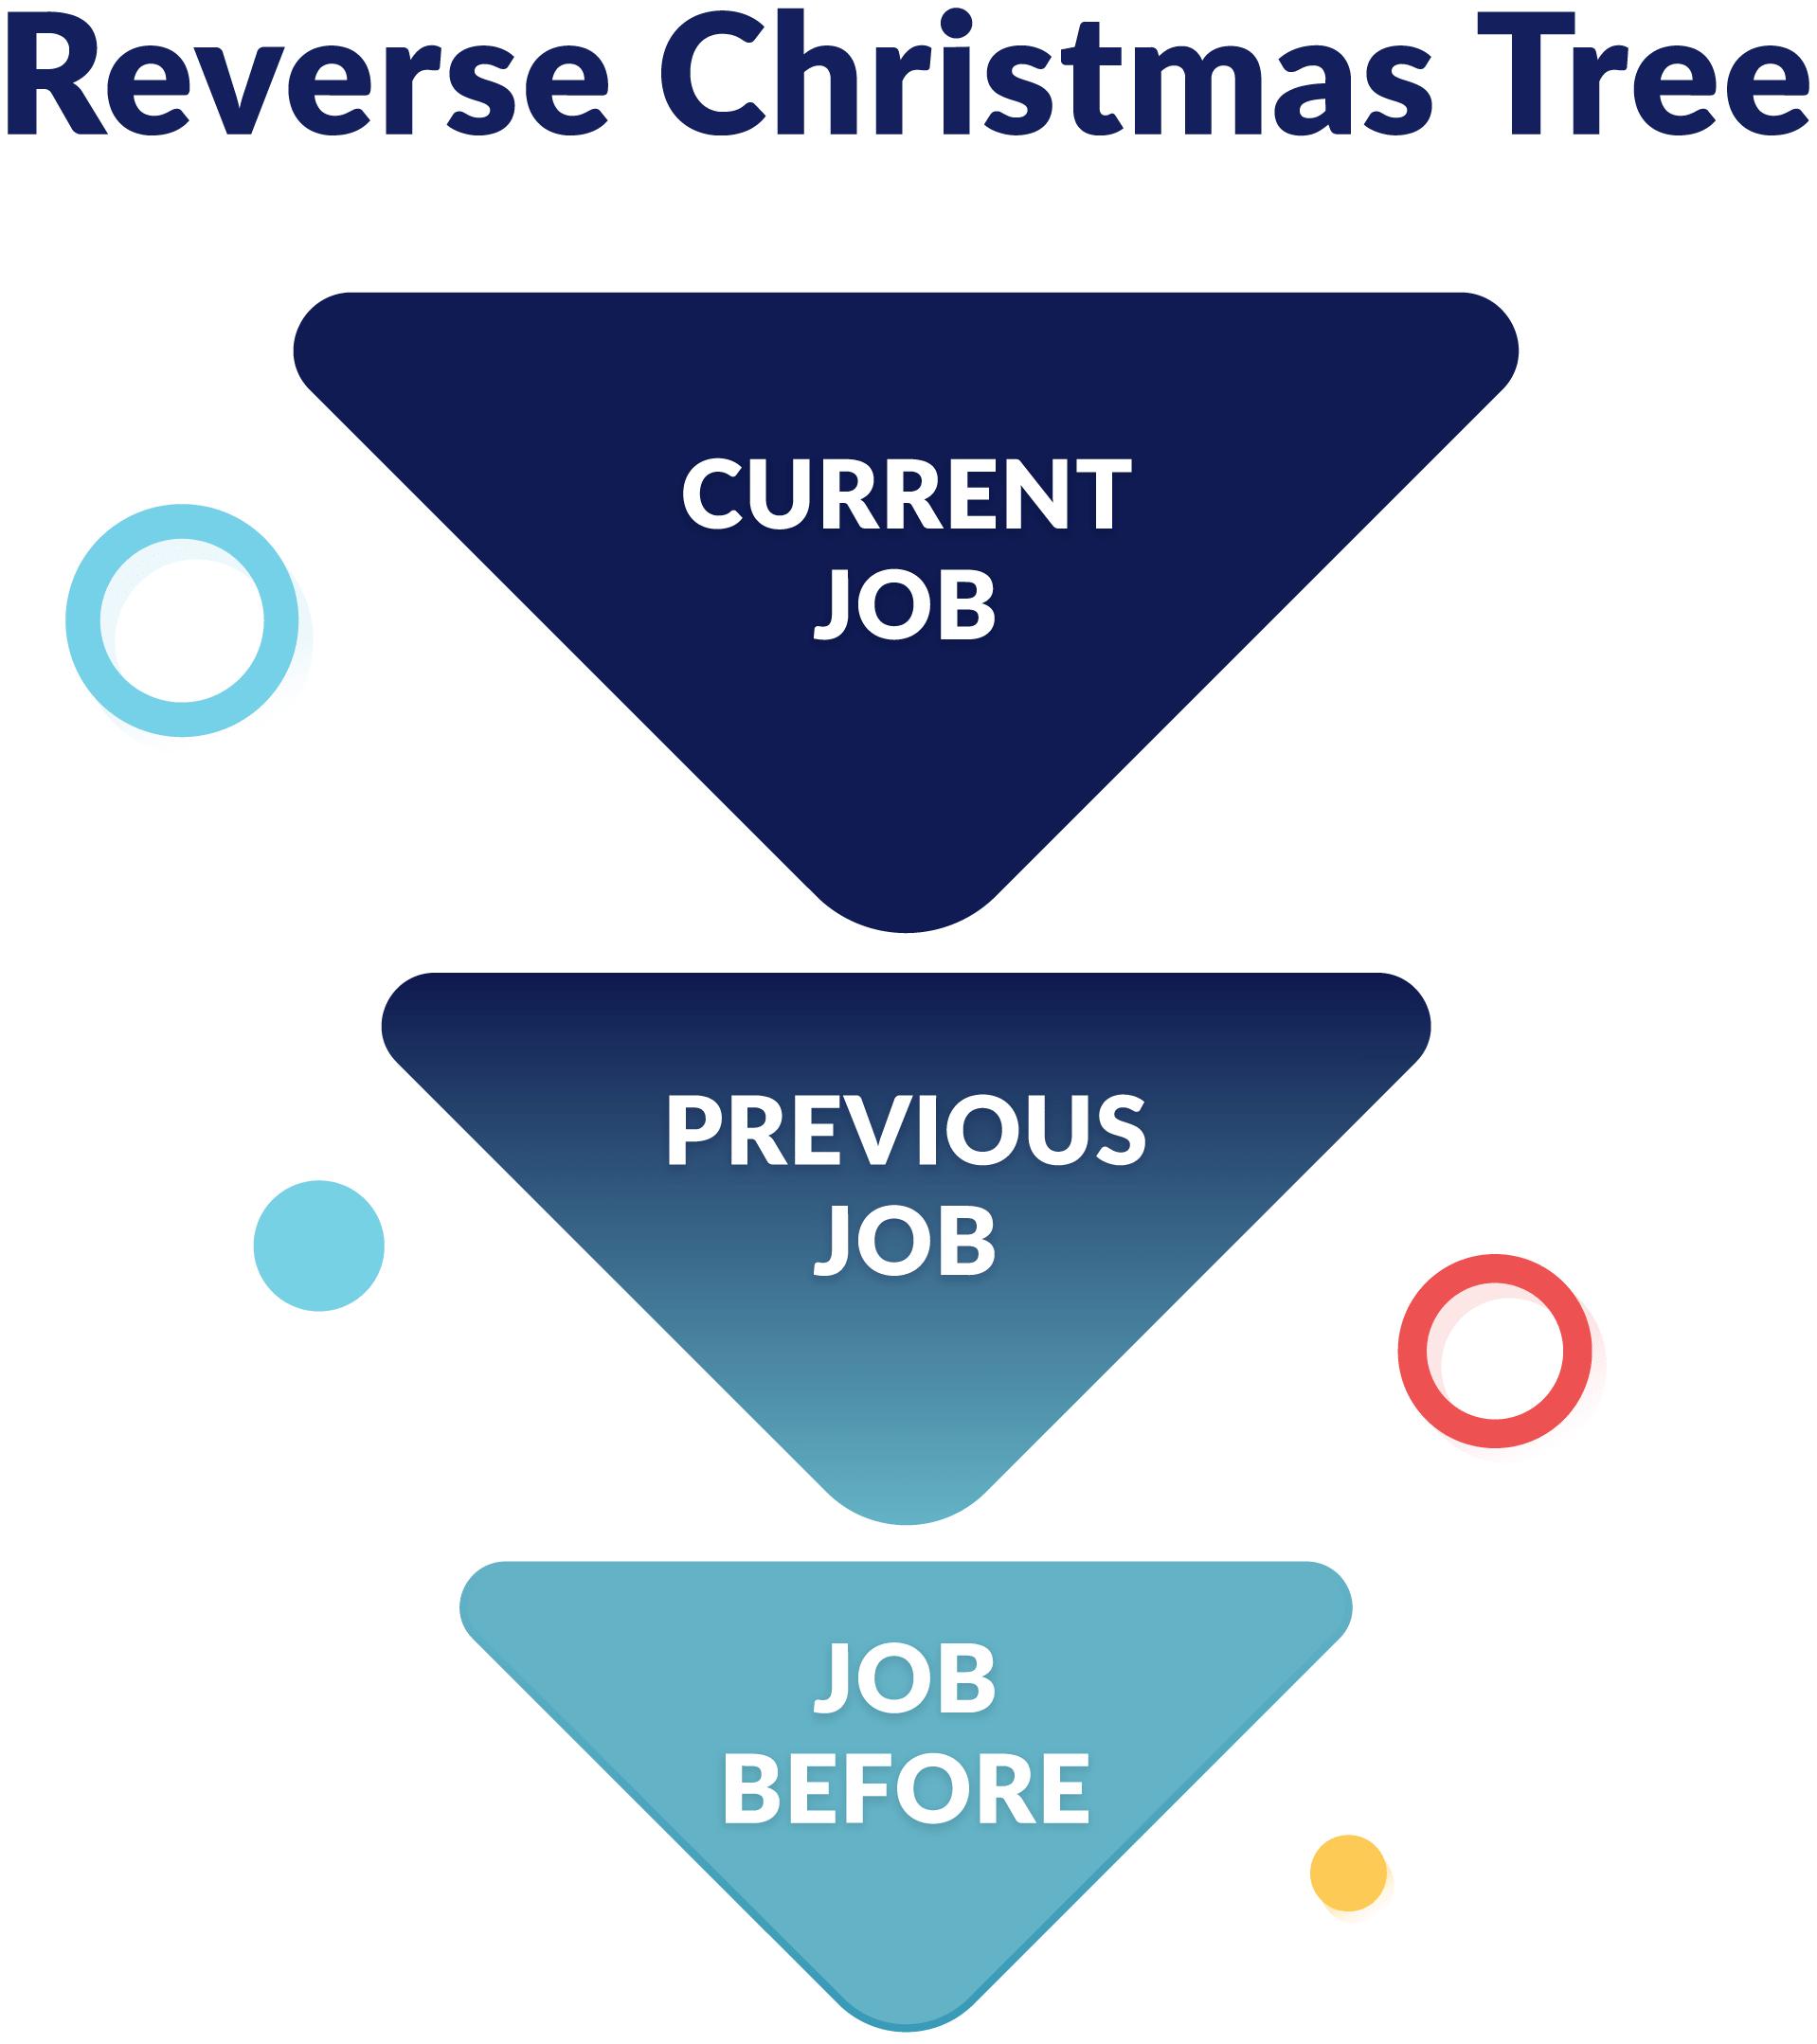 reverse-christnas-tree-diagram